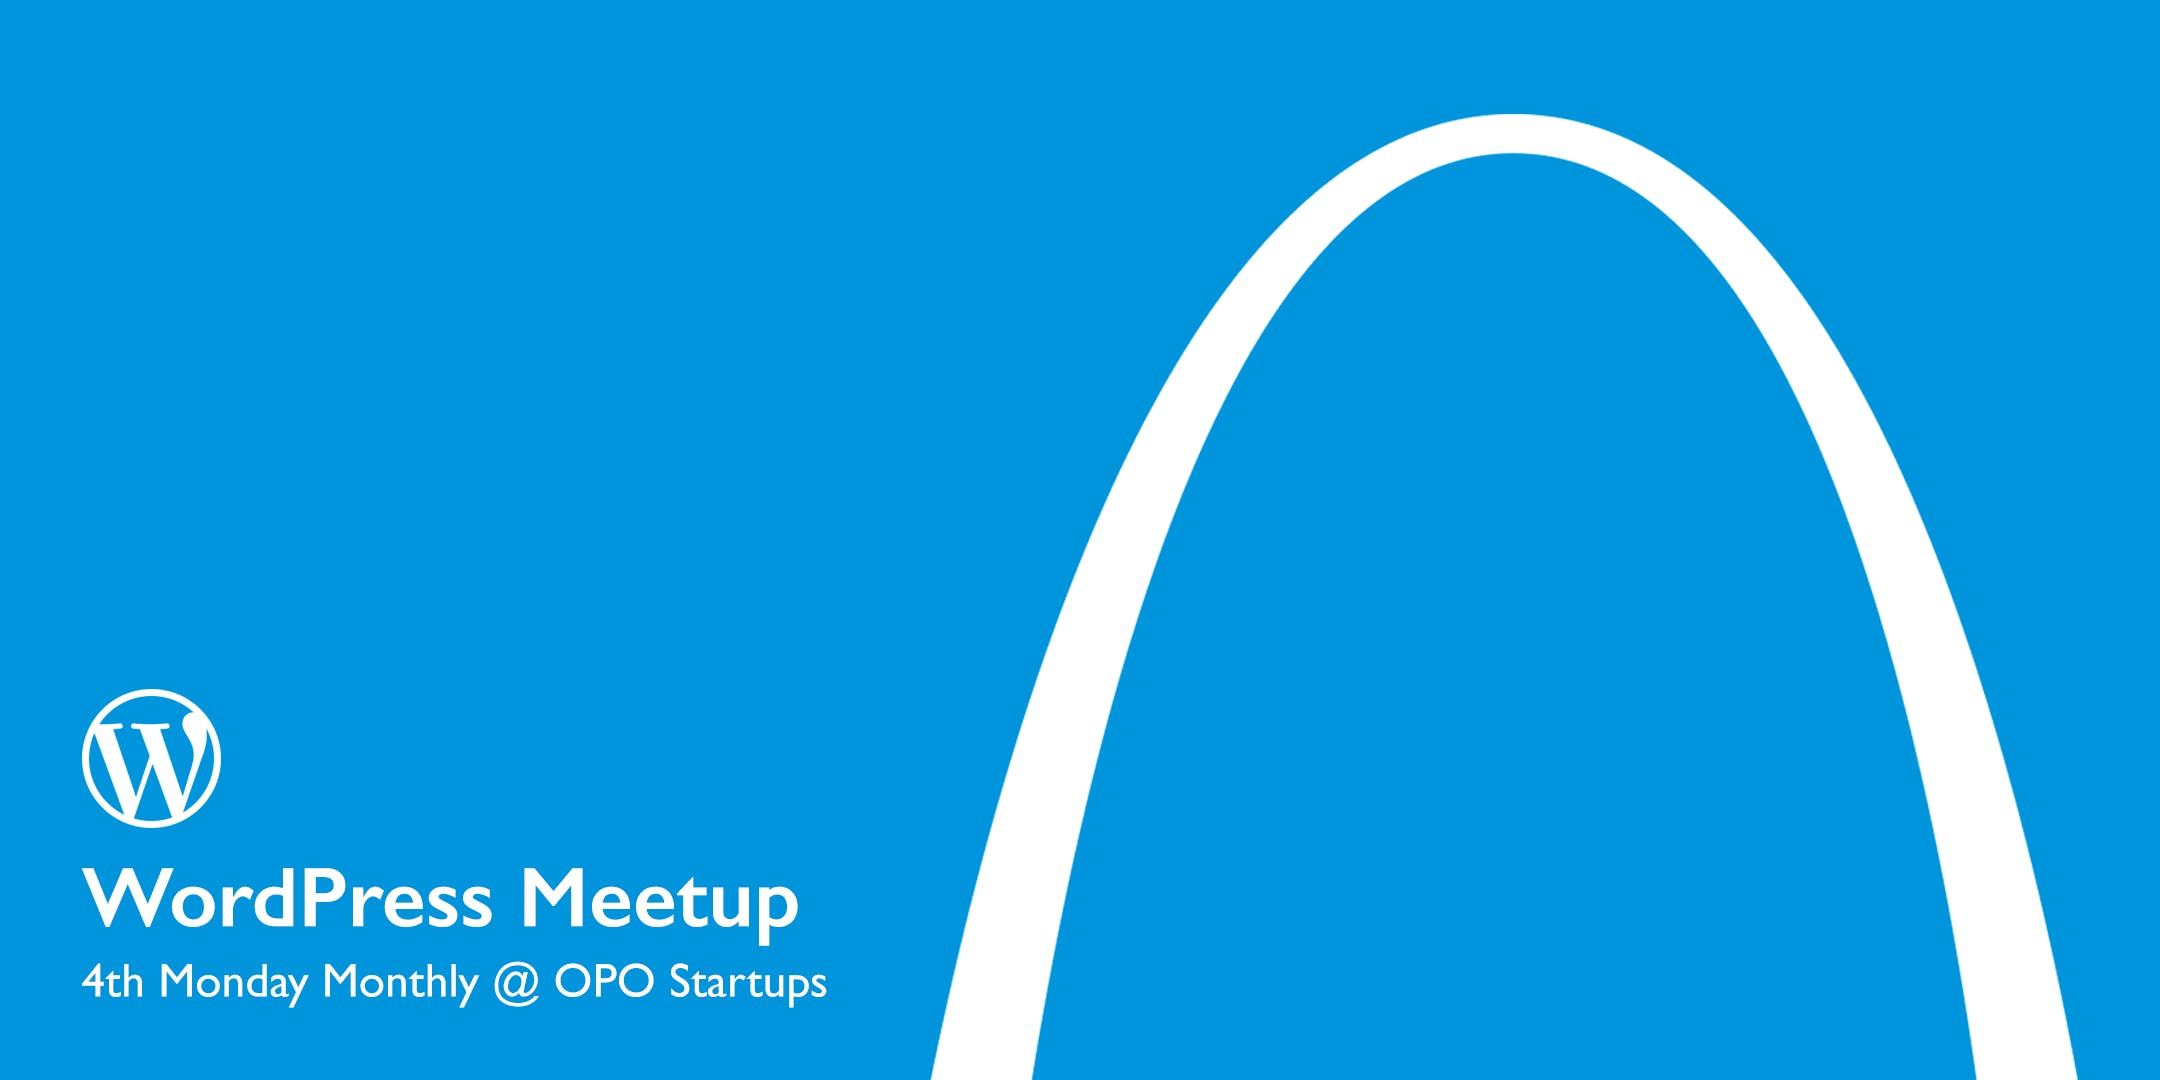 WordPress MeetUp @ OPO